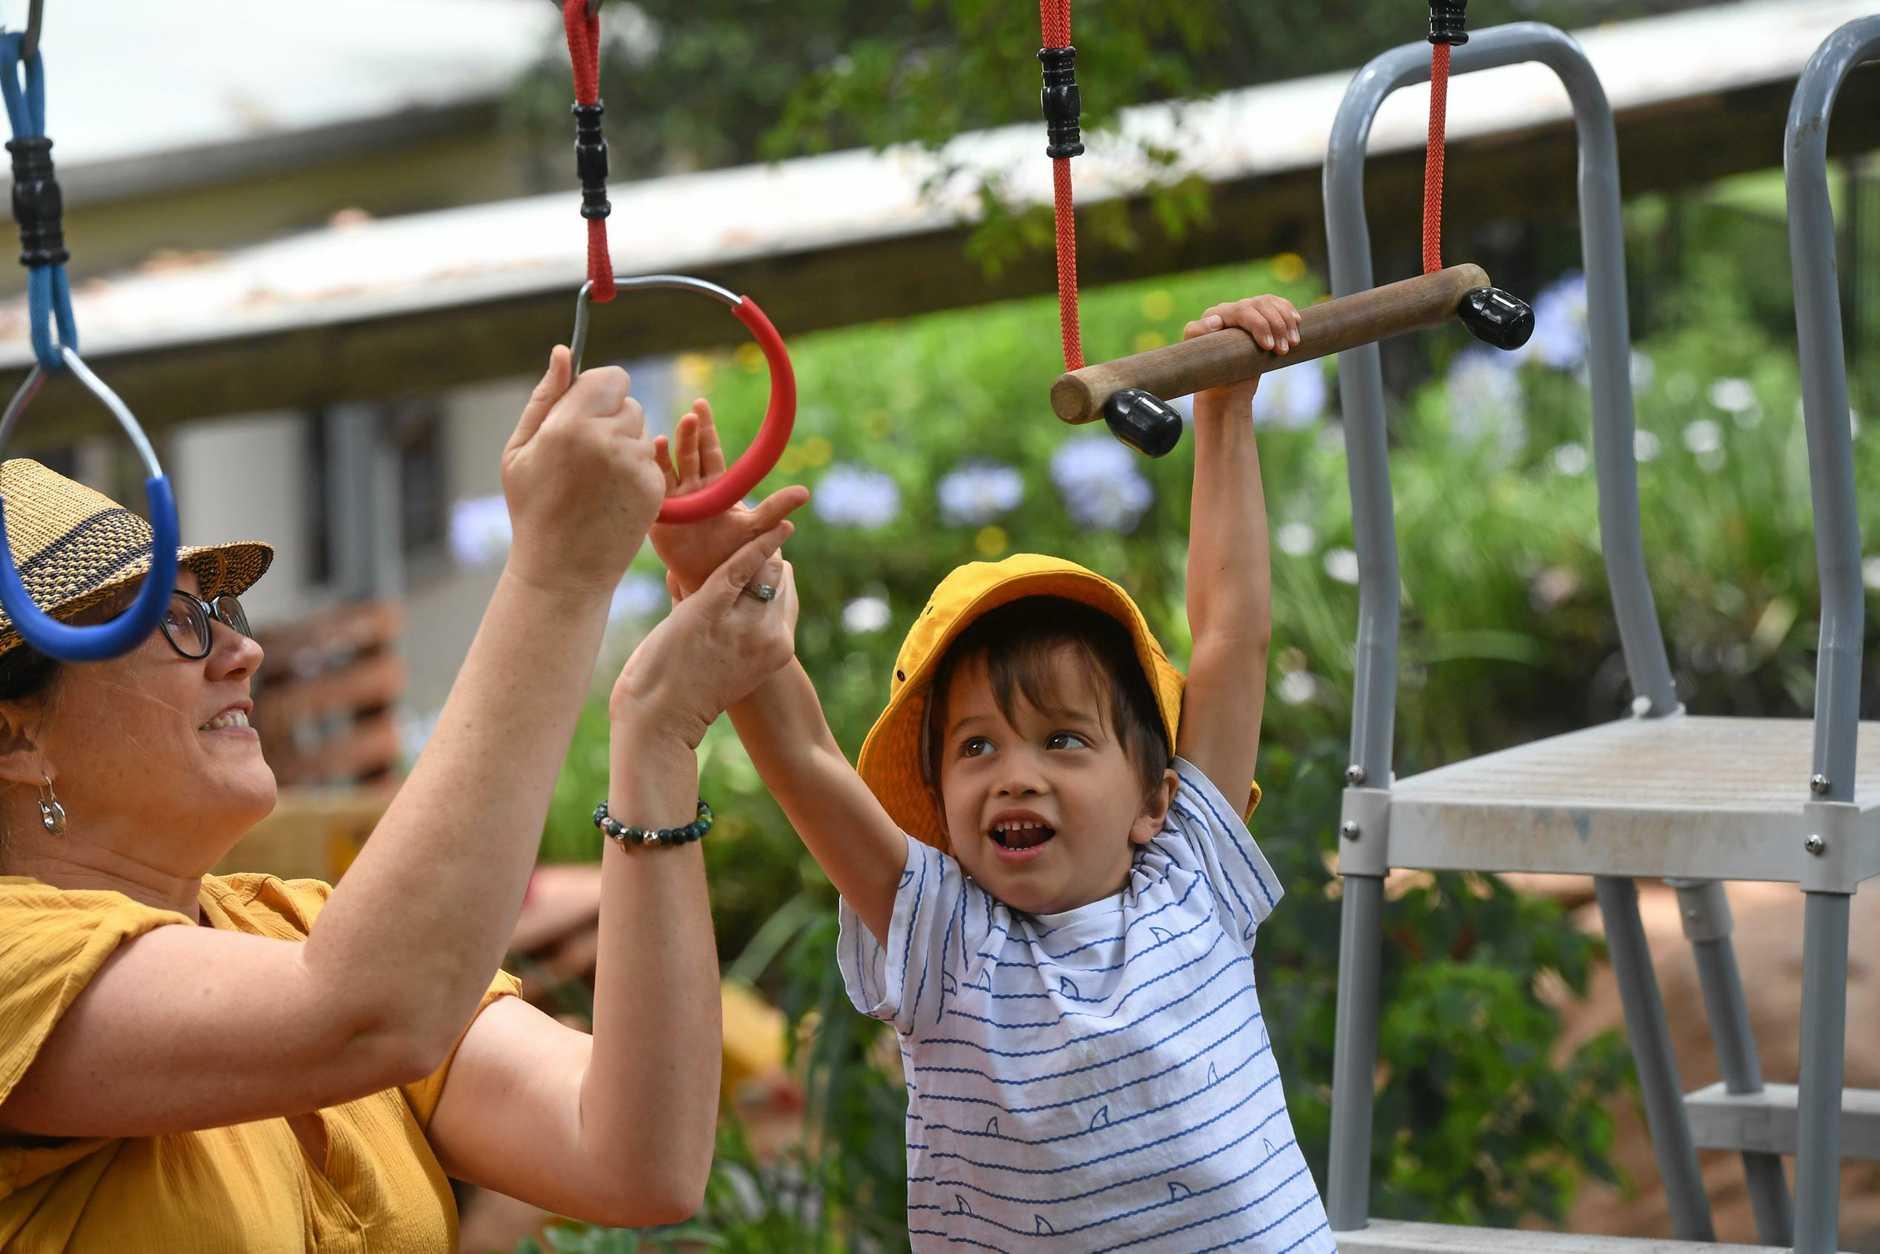 Finn deHeer, 5, enjoys some valuable outdoor playtime at Clunes Community Preschool.